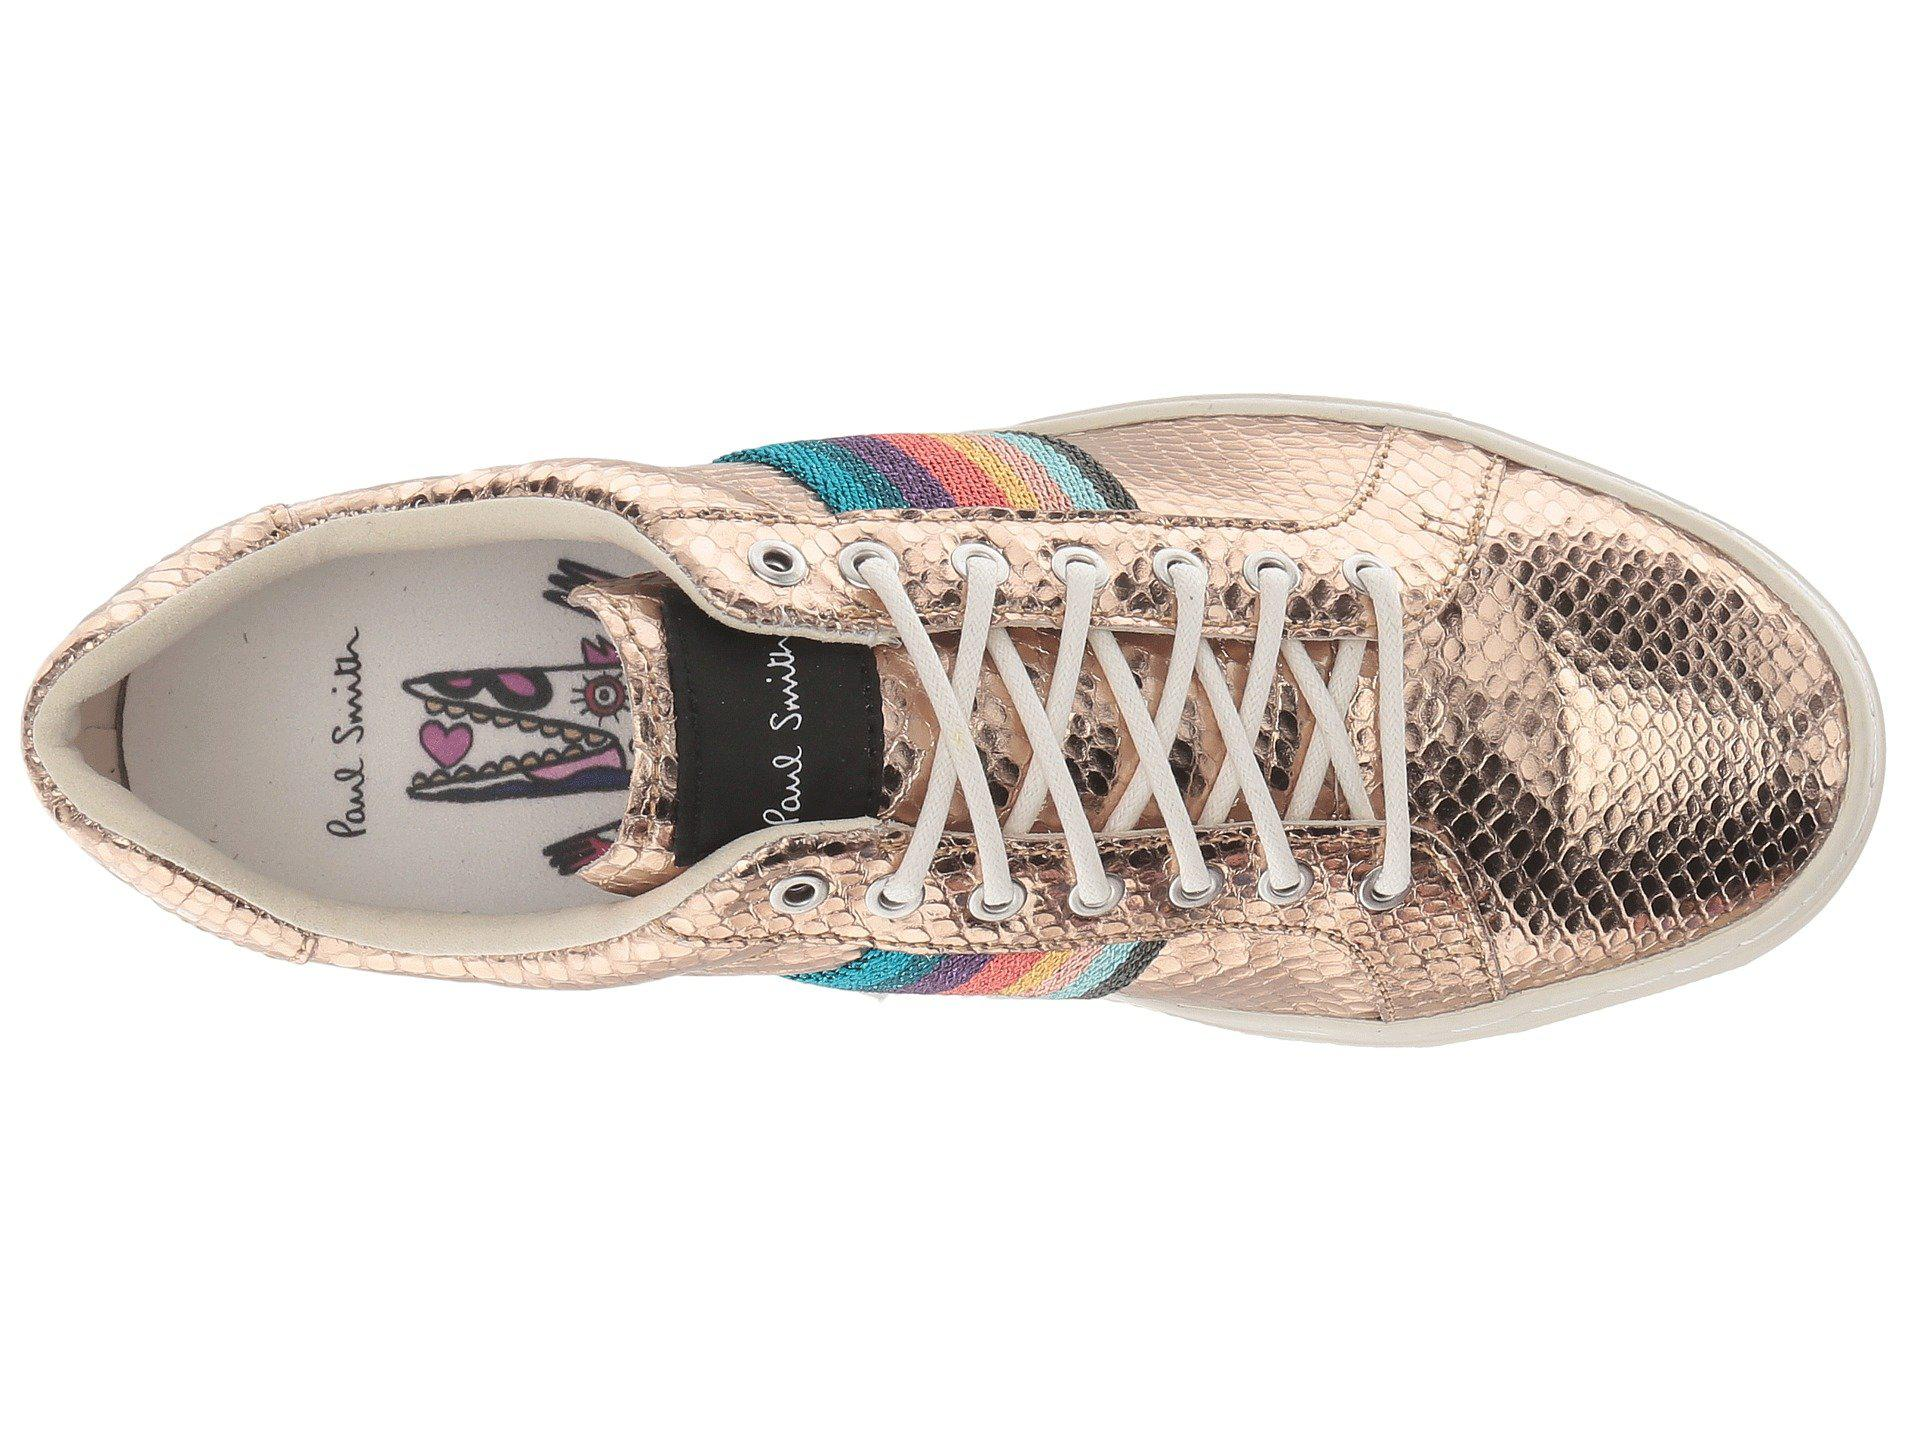 d480b7b43fb6 Lyst paul smith lapin sneaker gold womens shoes in metallic jpg 1920x1440  Madden lapin